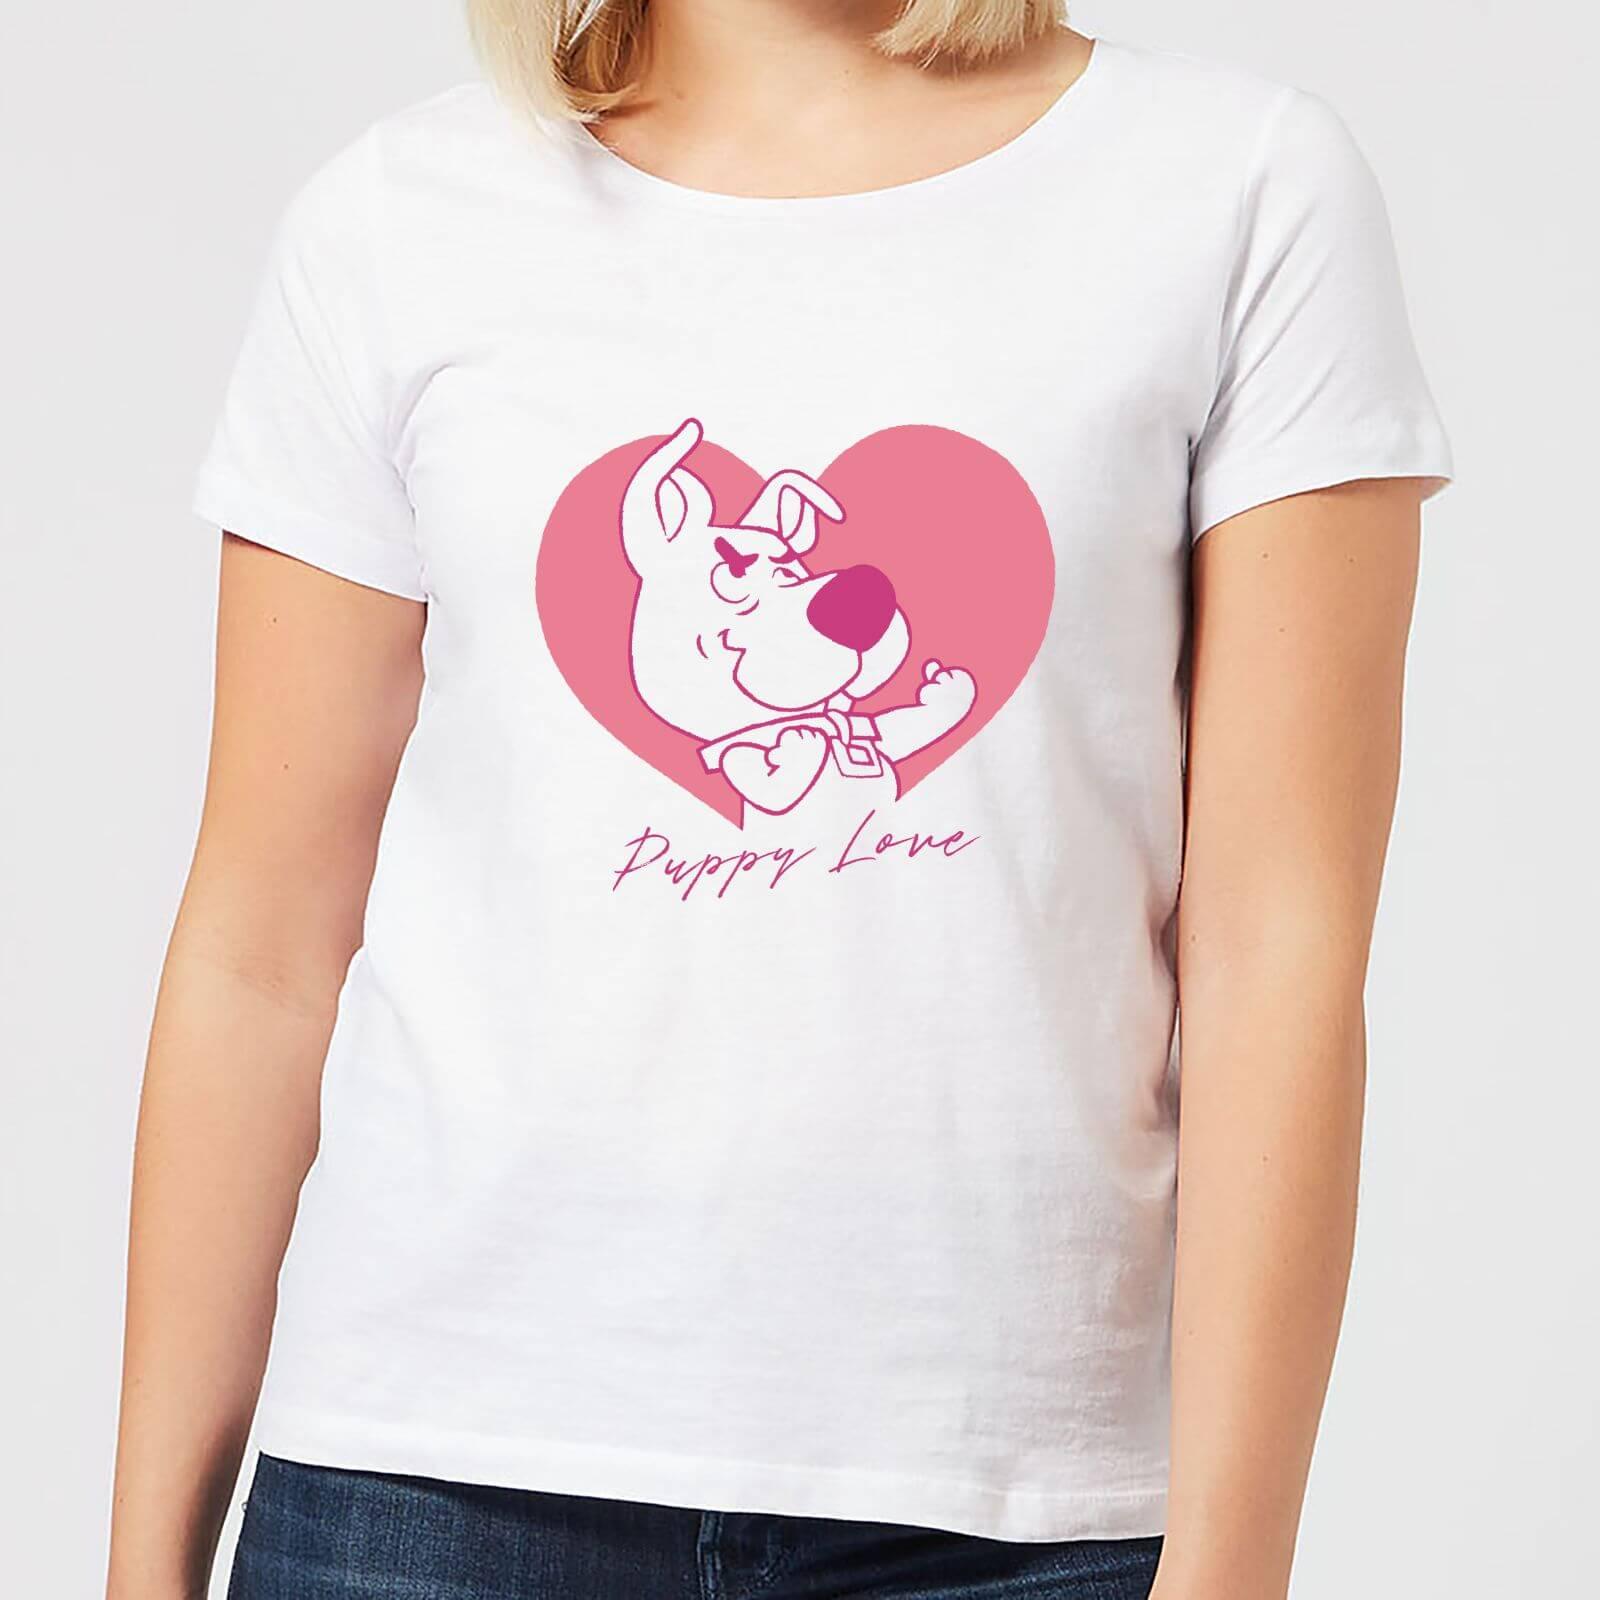 Scooby Doo Puppy Love Women's T-Shirt - White - M - White